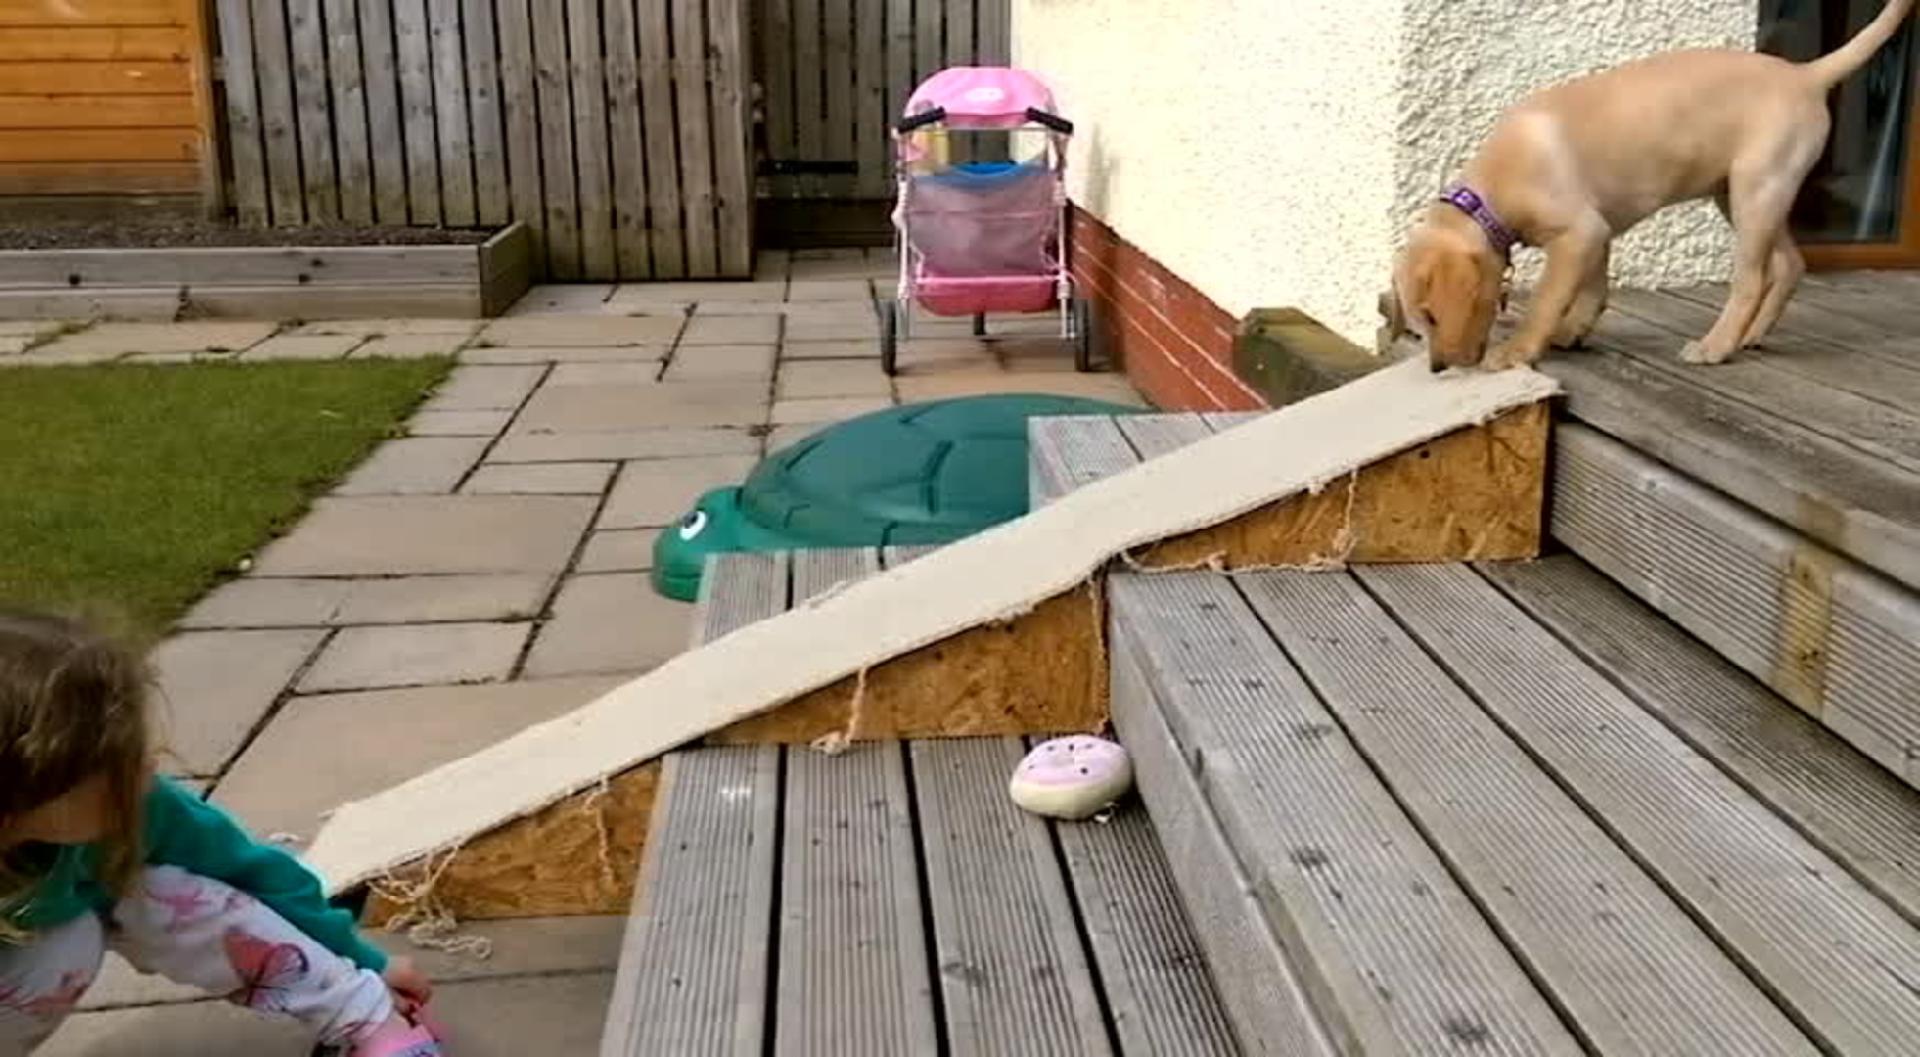 Puppy Slides down Hardwood Floors | Jukin Media Inc